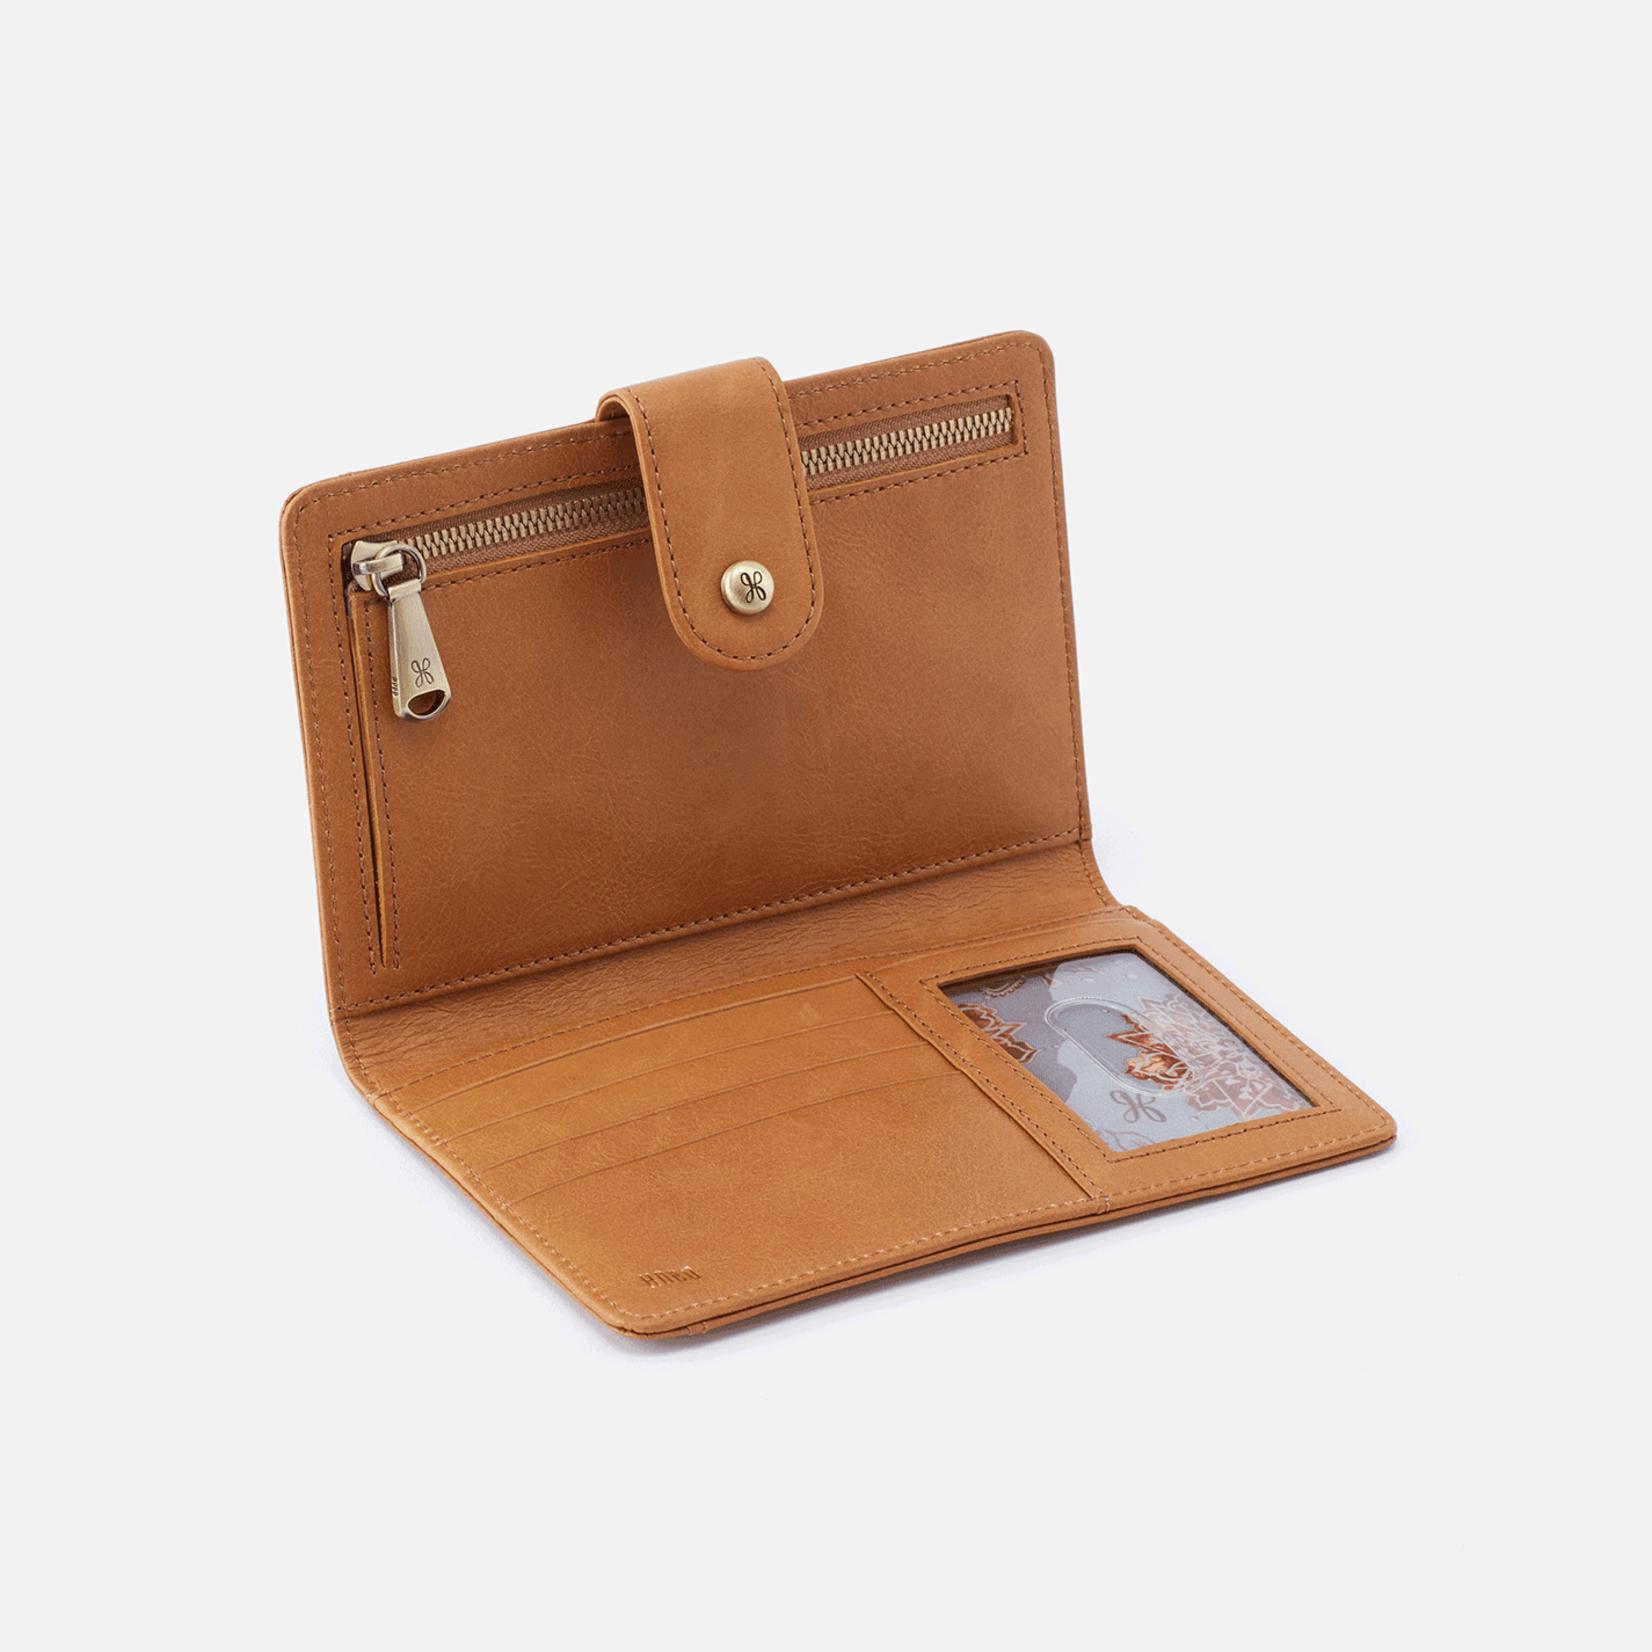 HOBO Pax Honey Matte Vintage Hide Leather Passport Holder/Wallet